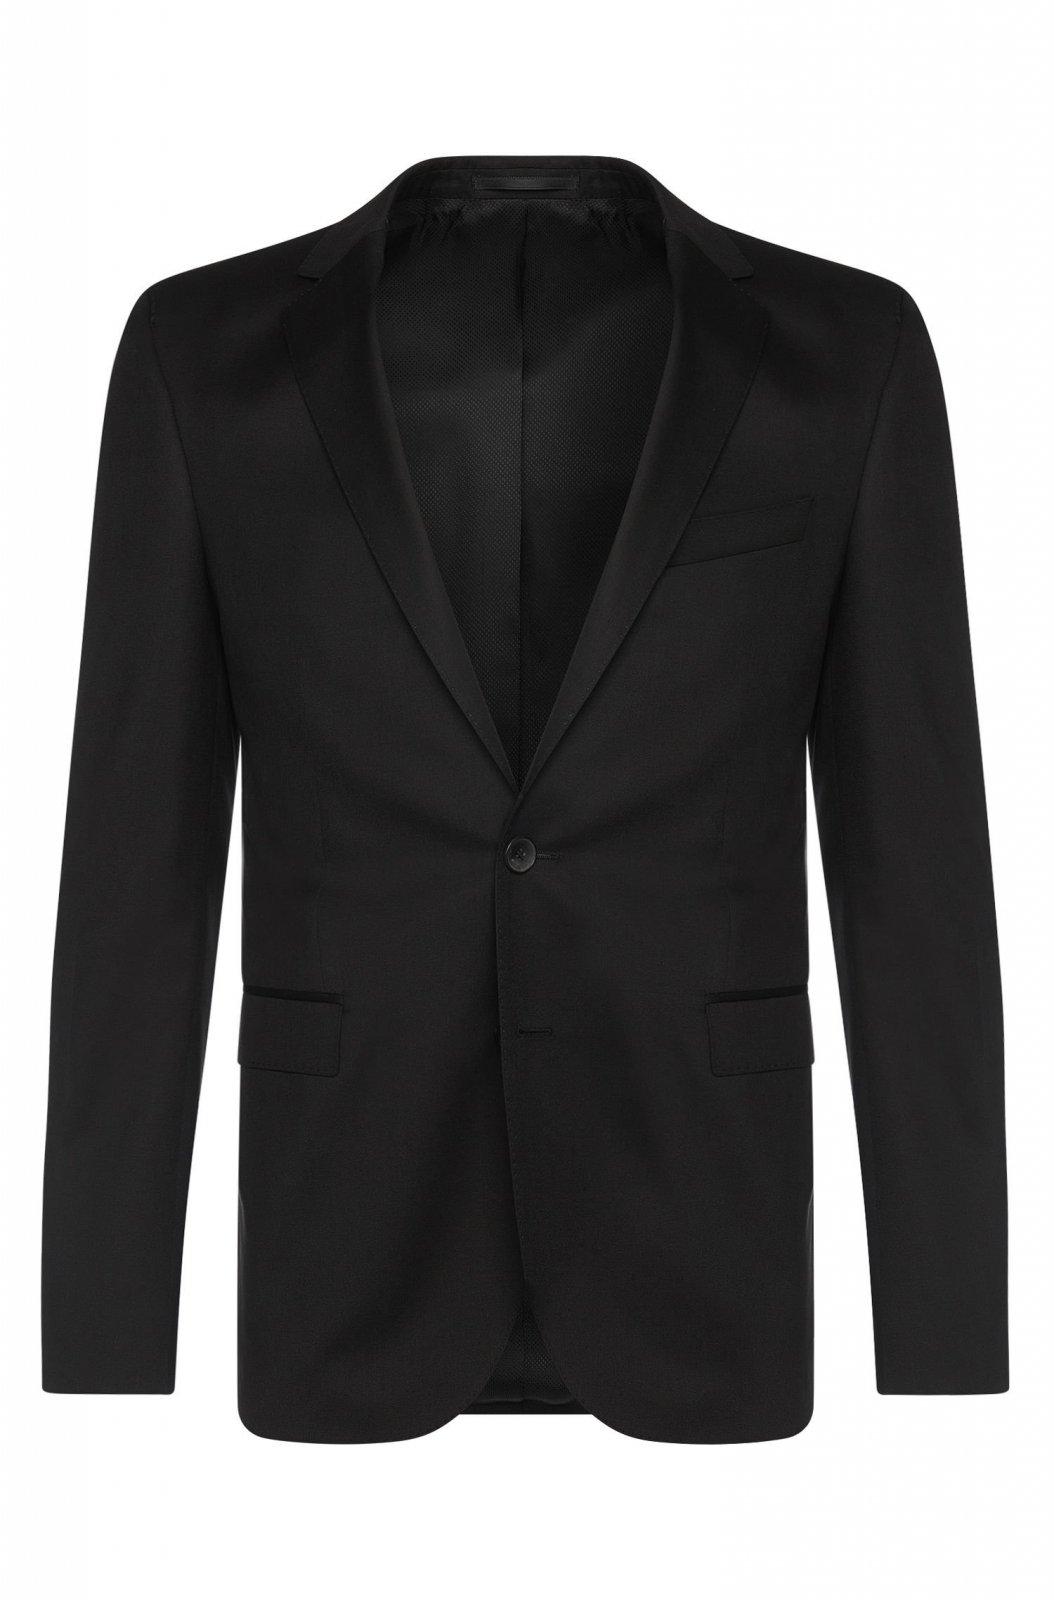 acheter populaire 063d6 f1324 HUGO BOSS Veste de costume Ryan